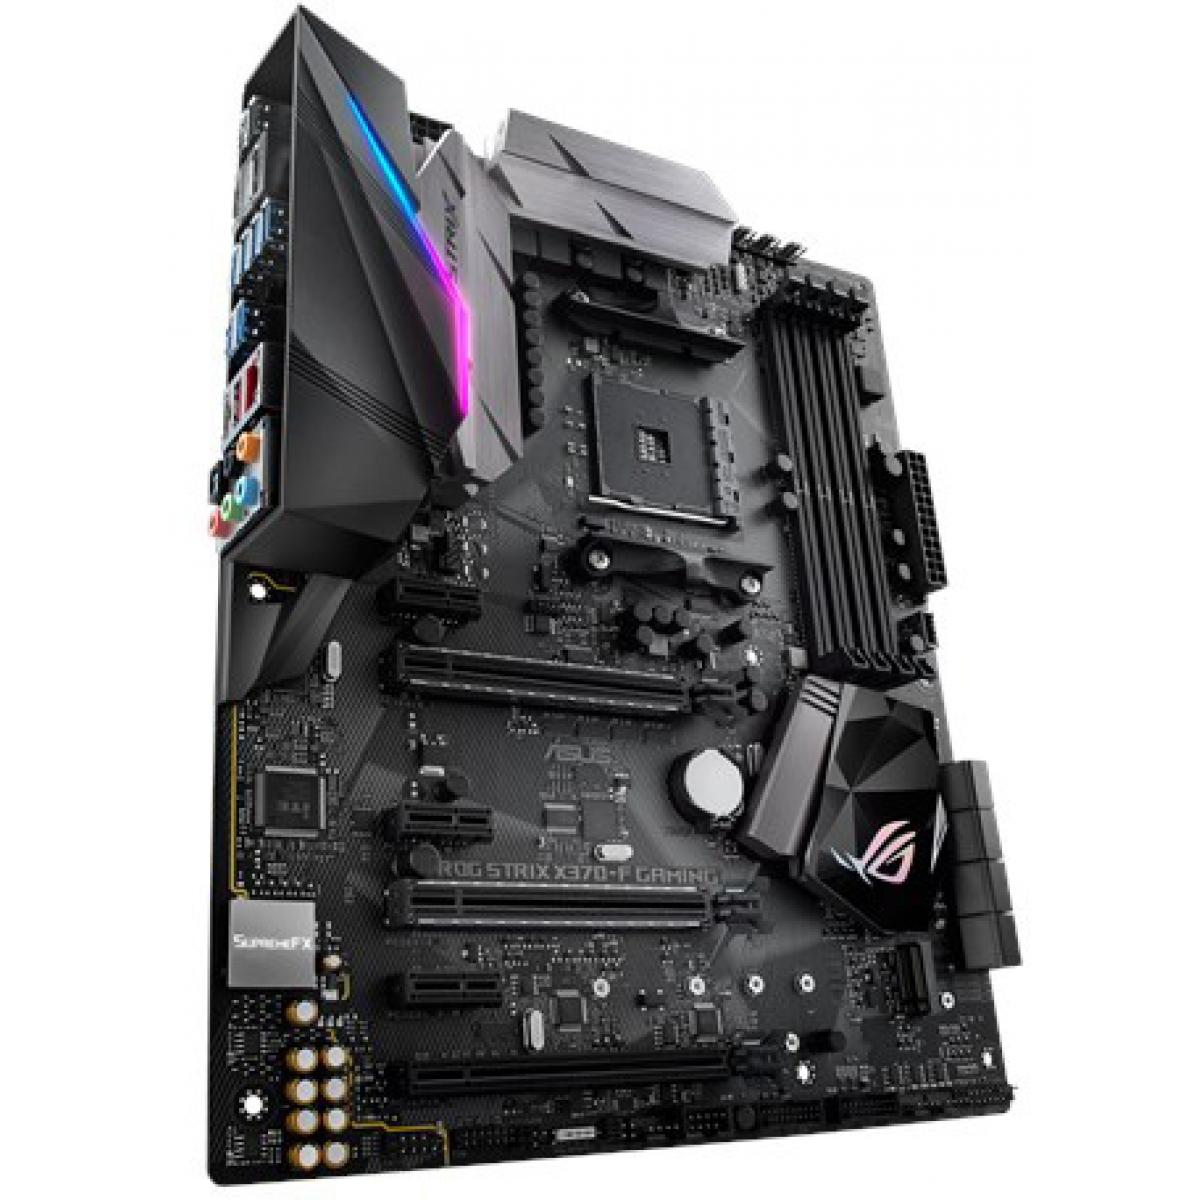 Placa Mãe Asus ROG STRIX X370-F GAMING, Chipset X370, AMD AM4, ATX, DDR4